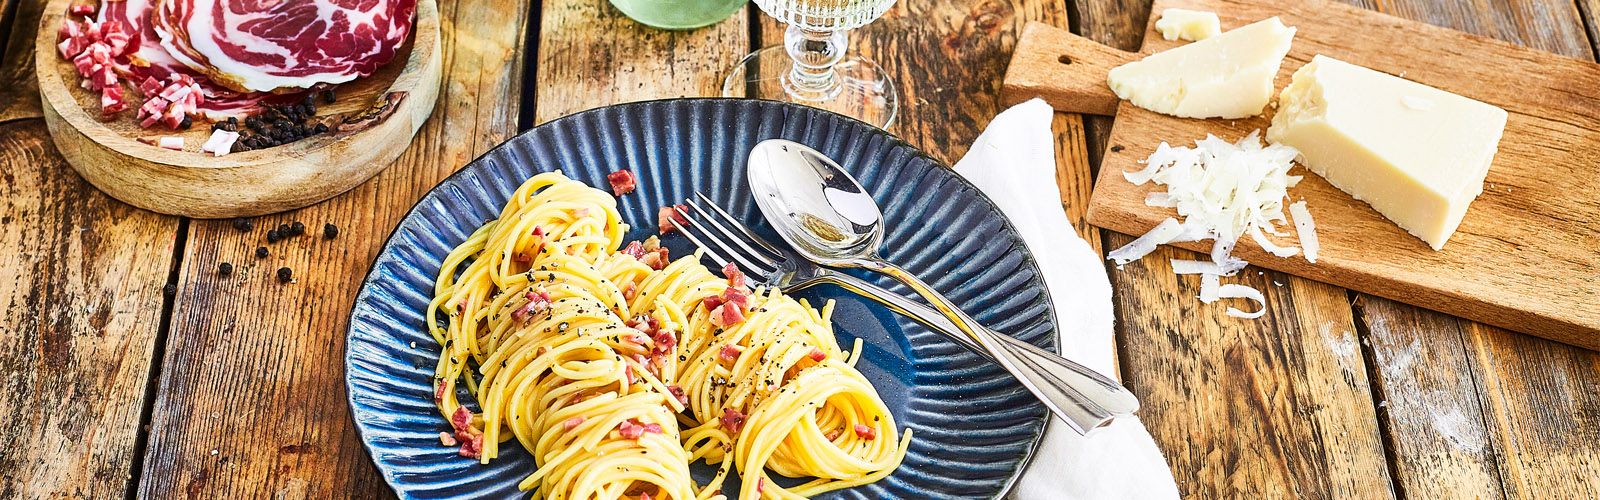 Spaghetti Carbonara mit Pancetta